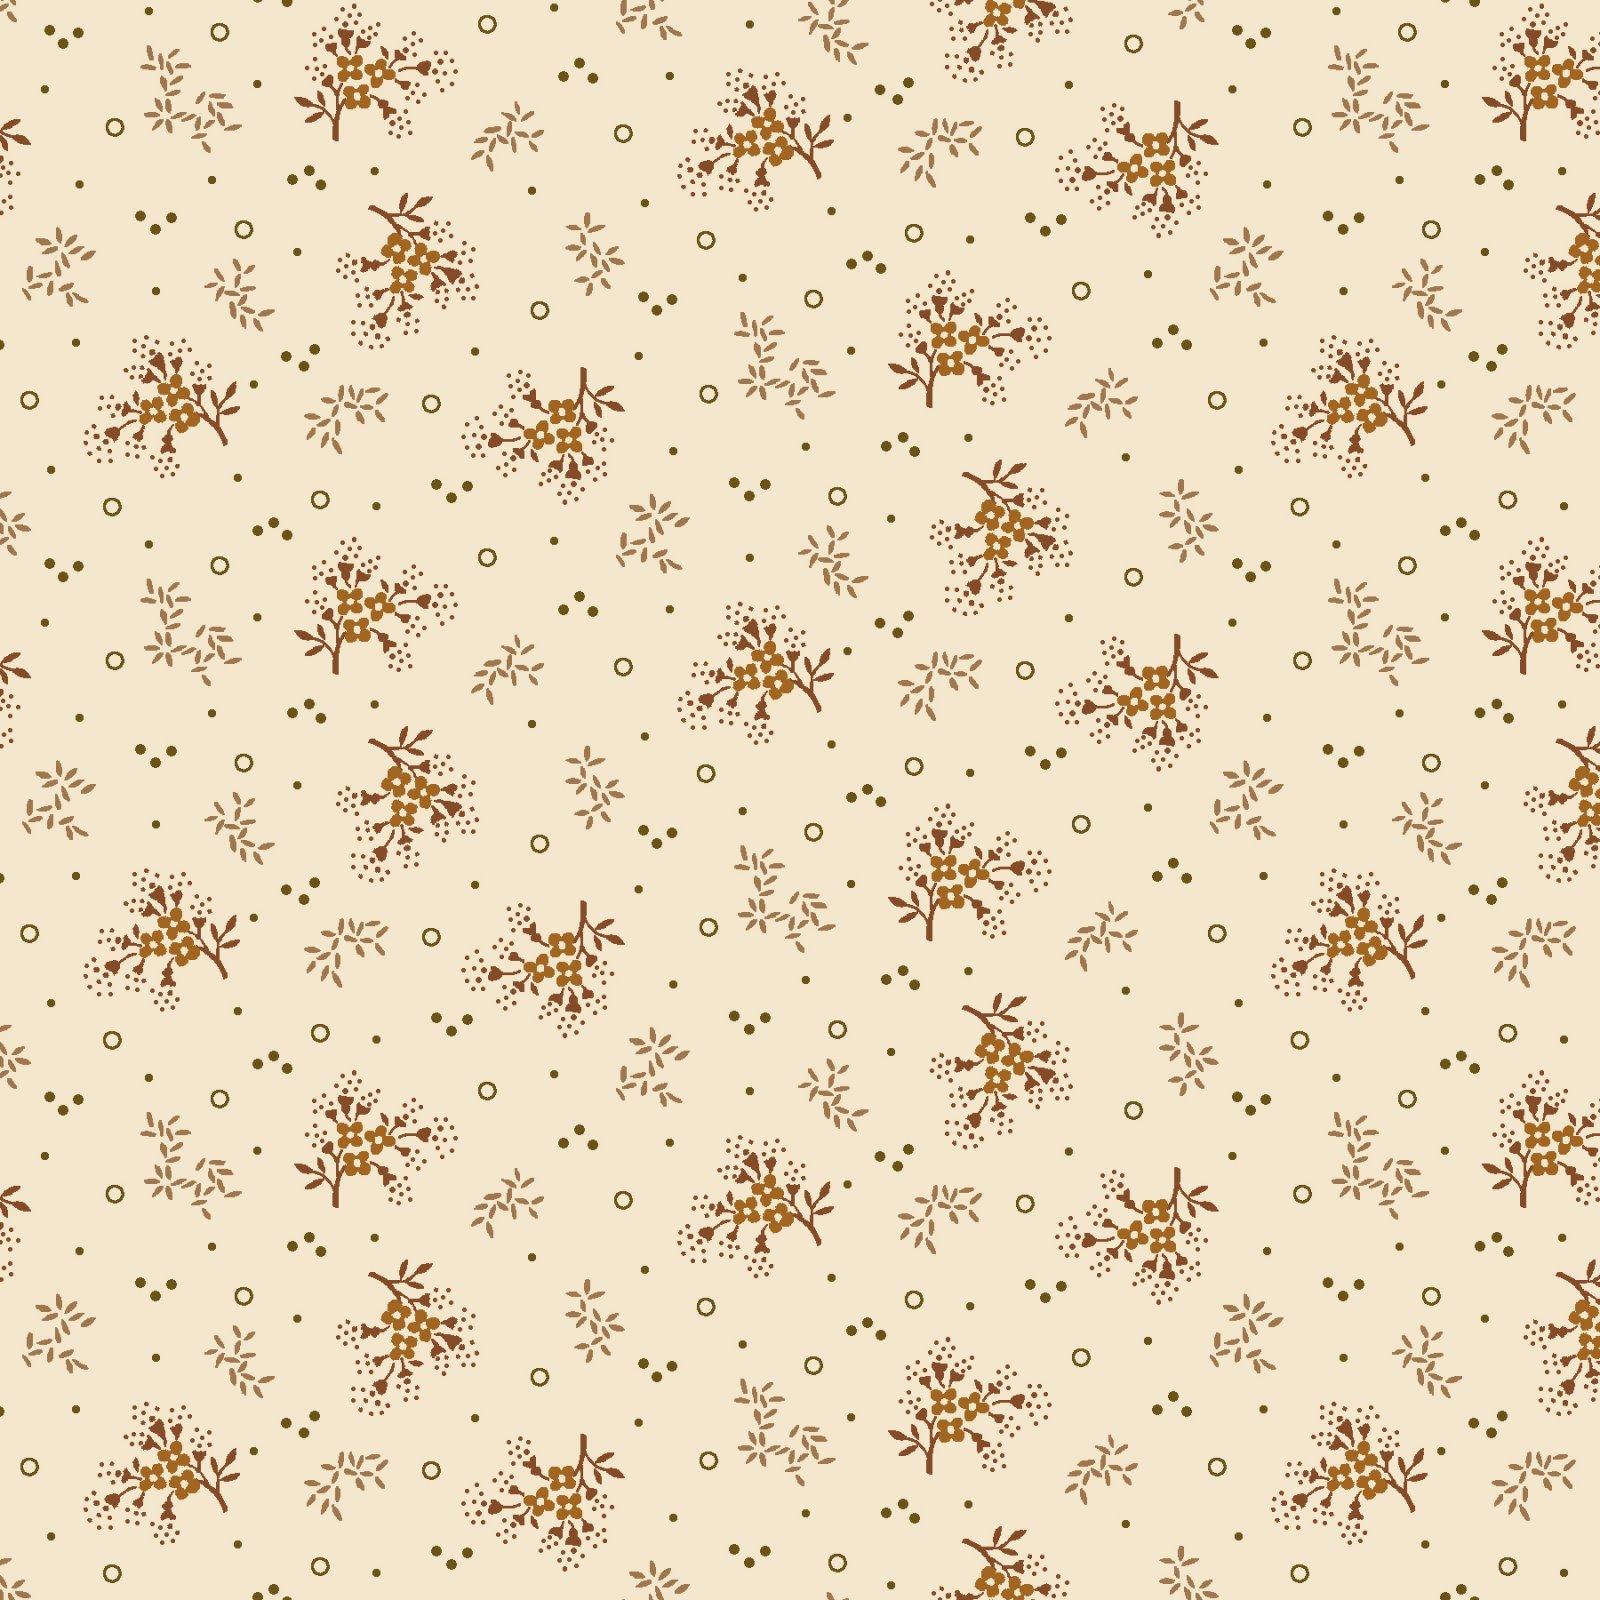 Buttermilk Autumn - 2274-33 * 1/2 yard